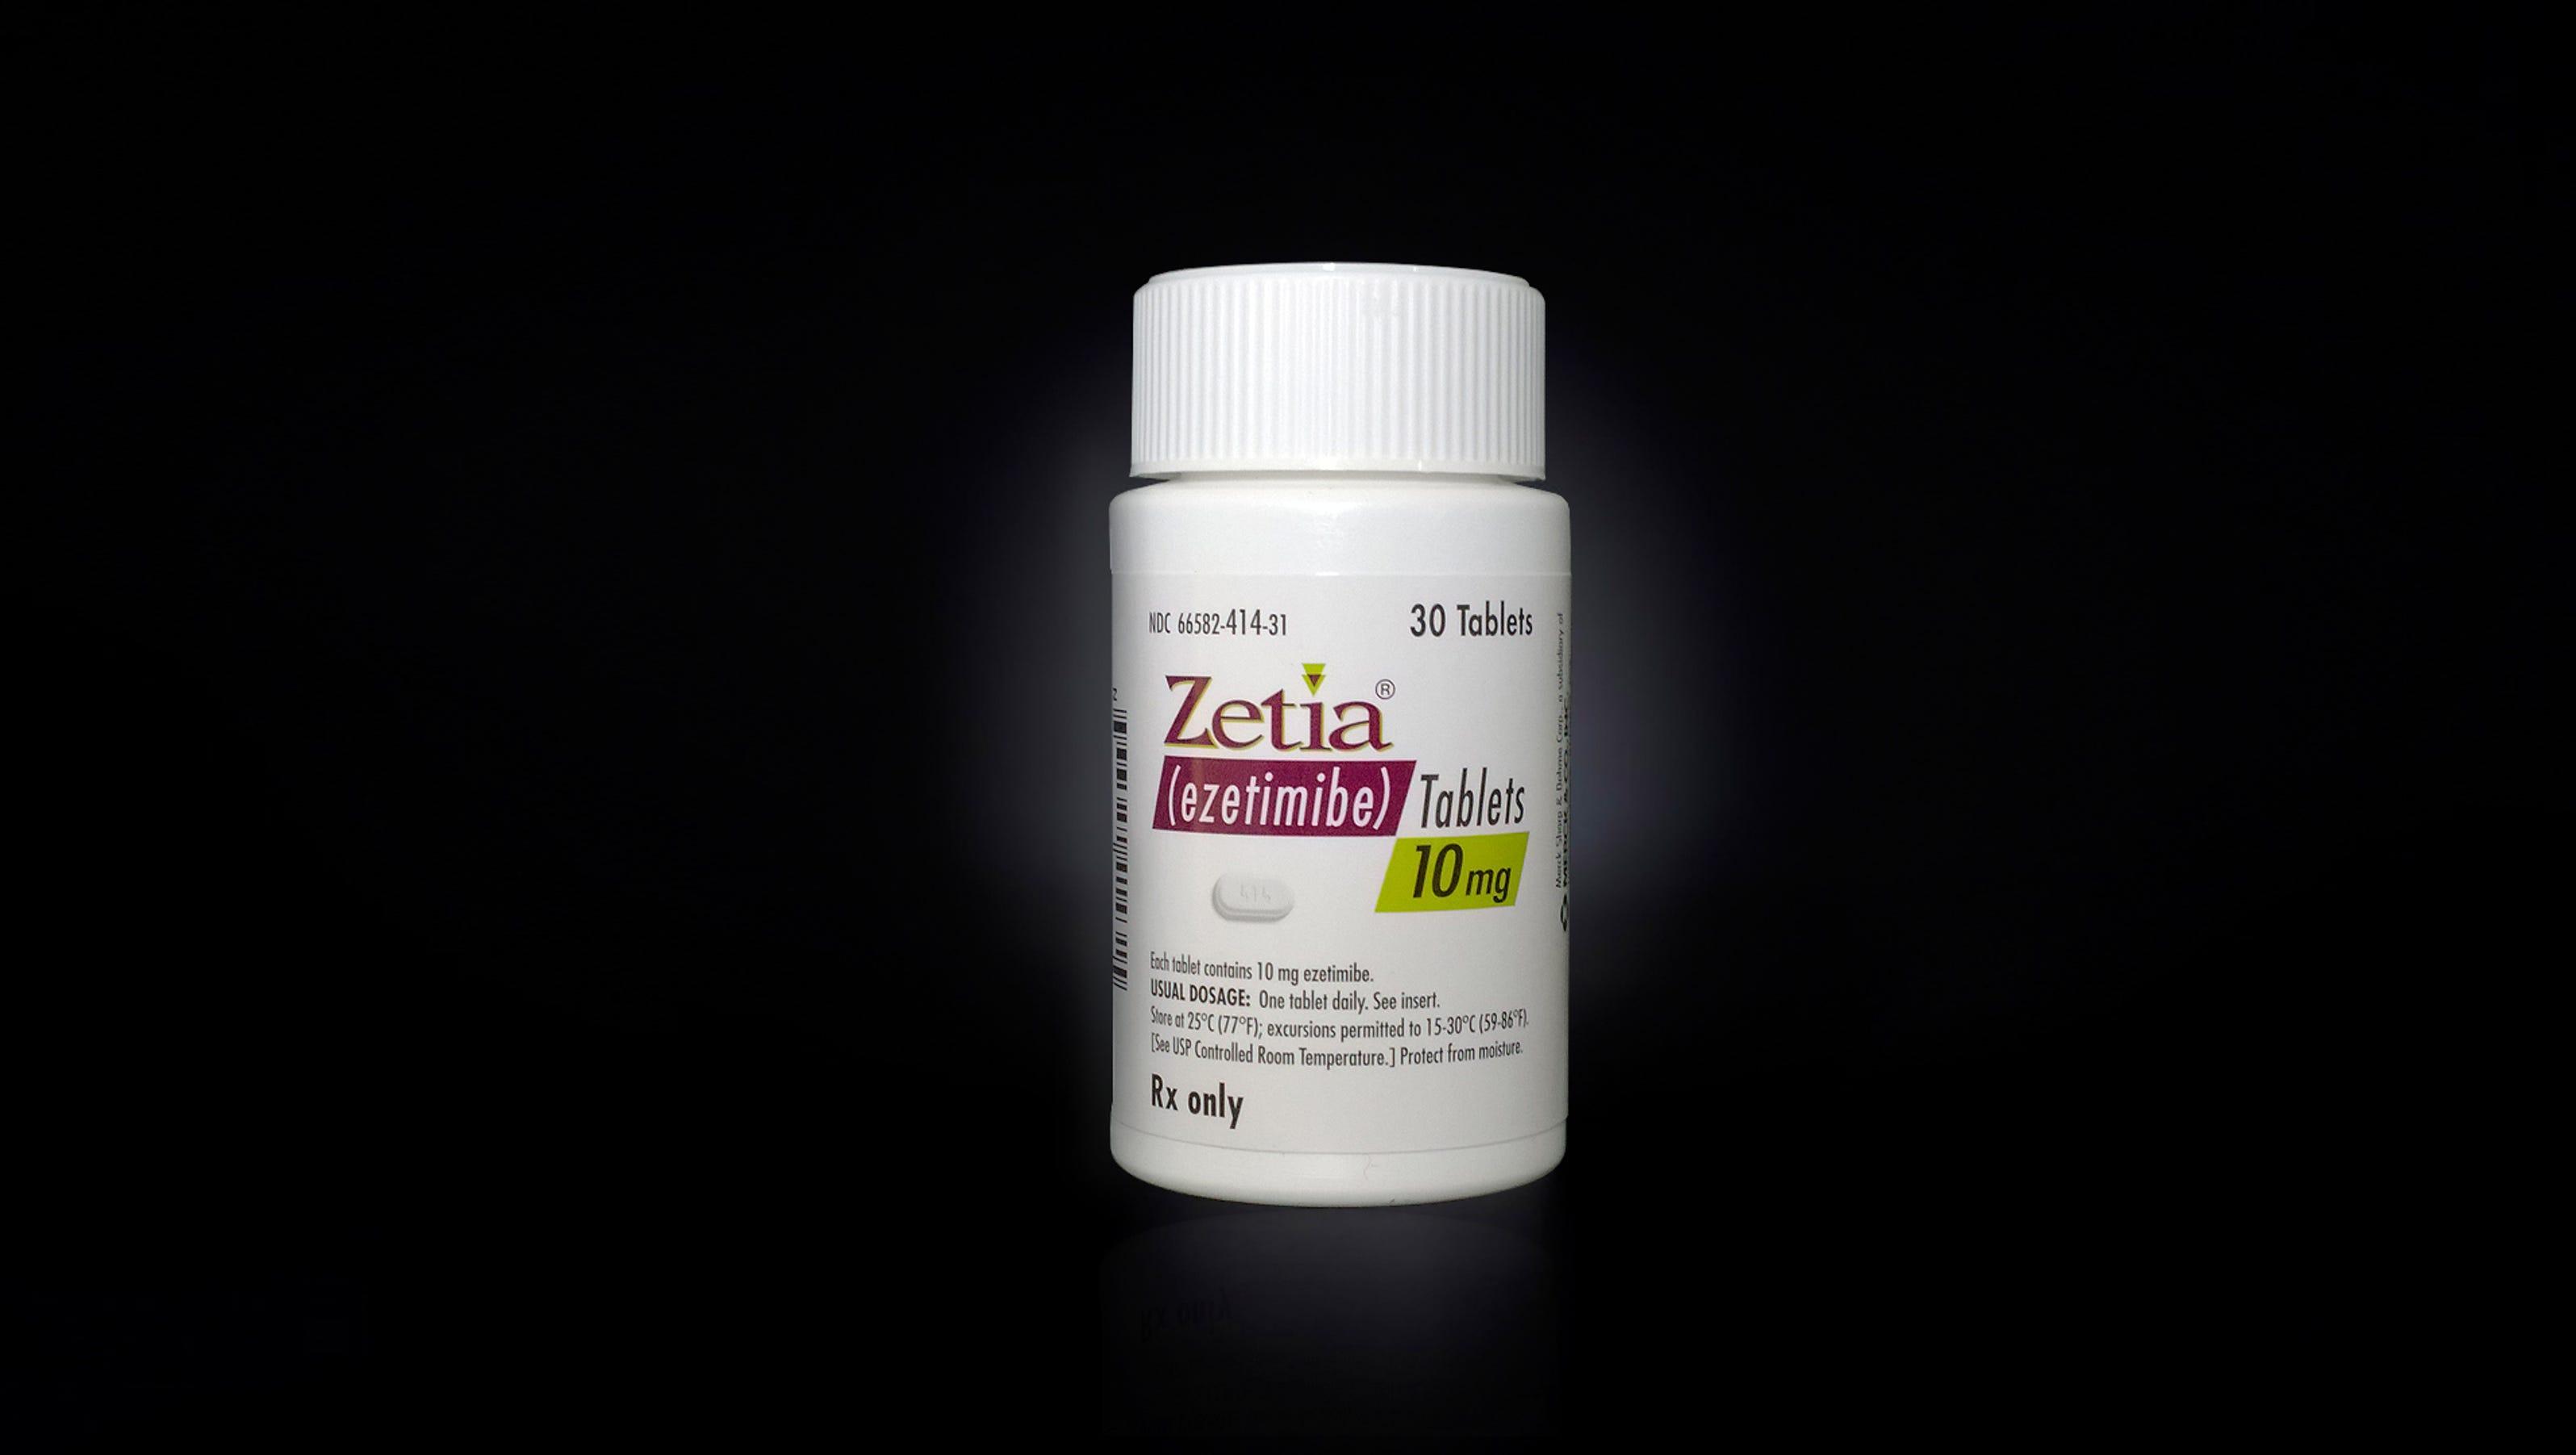 Zetia Statin Medication